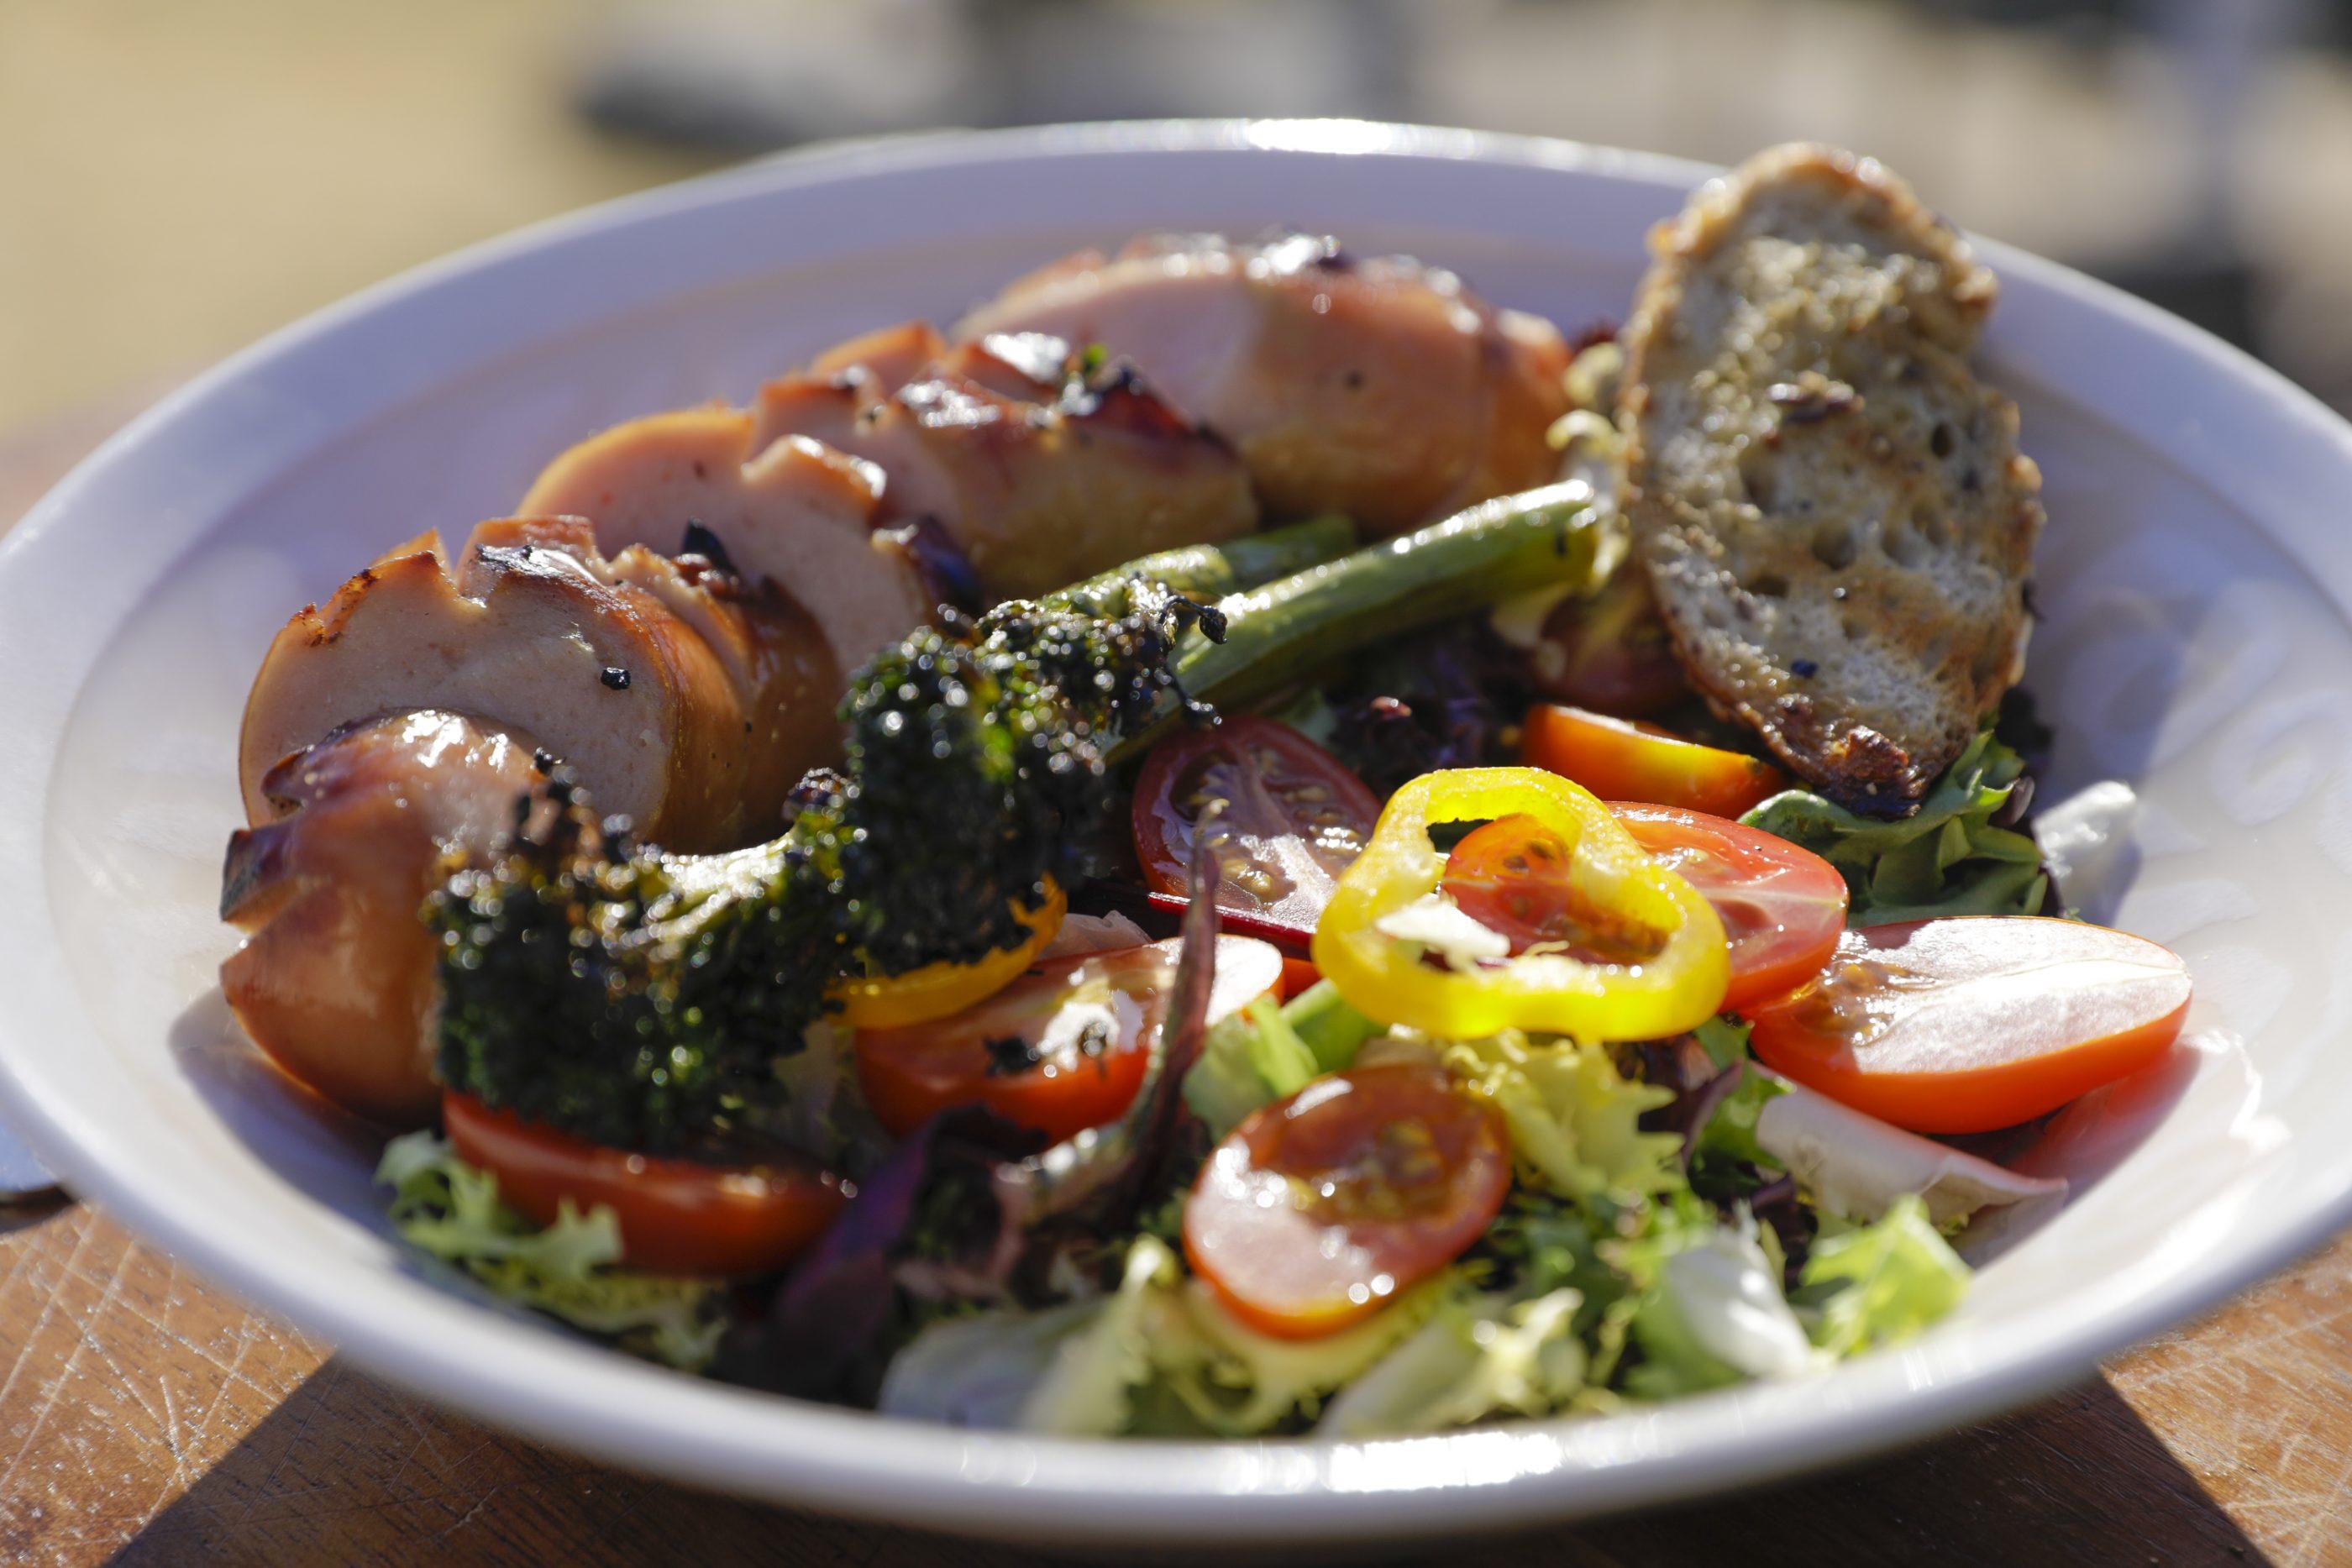 Broccoliinisalaatti ja grillikrutongit